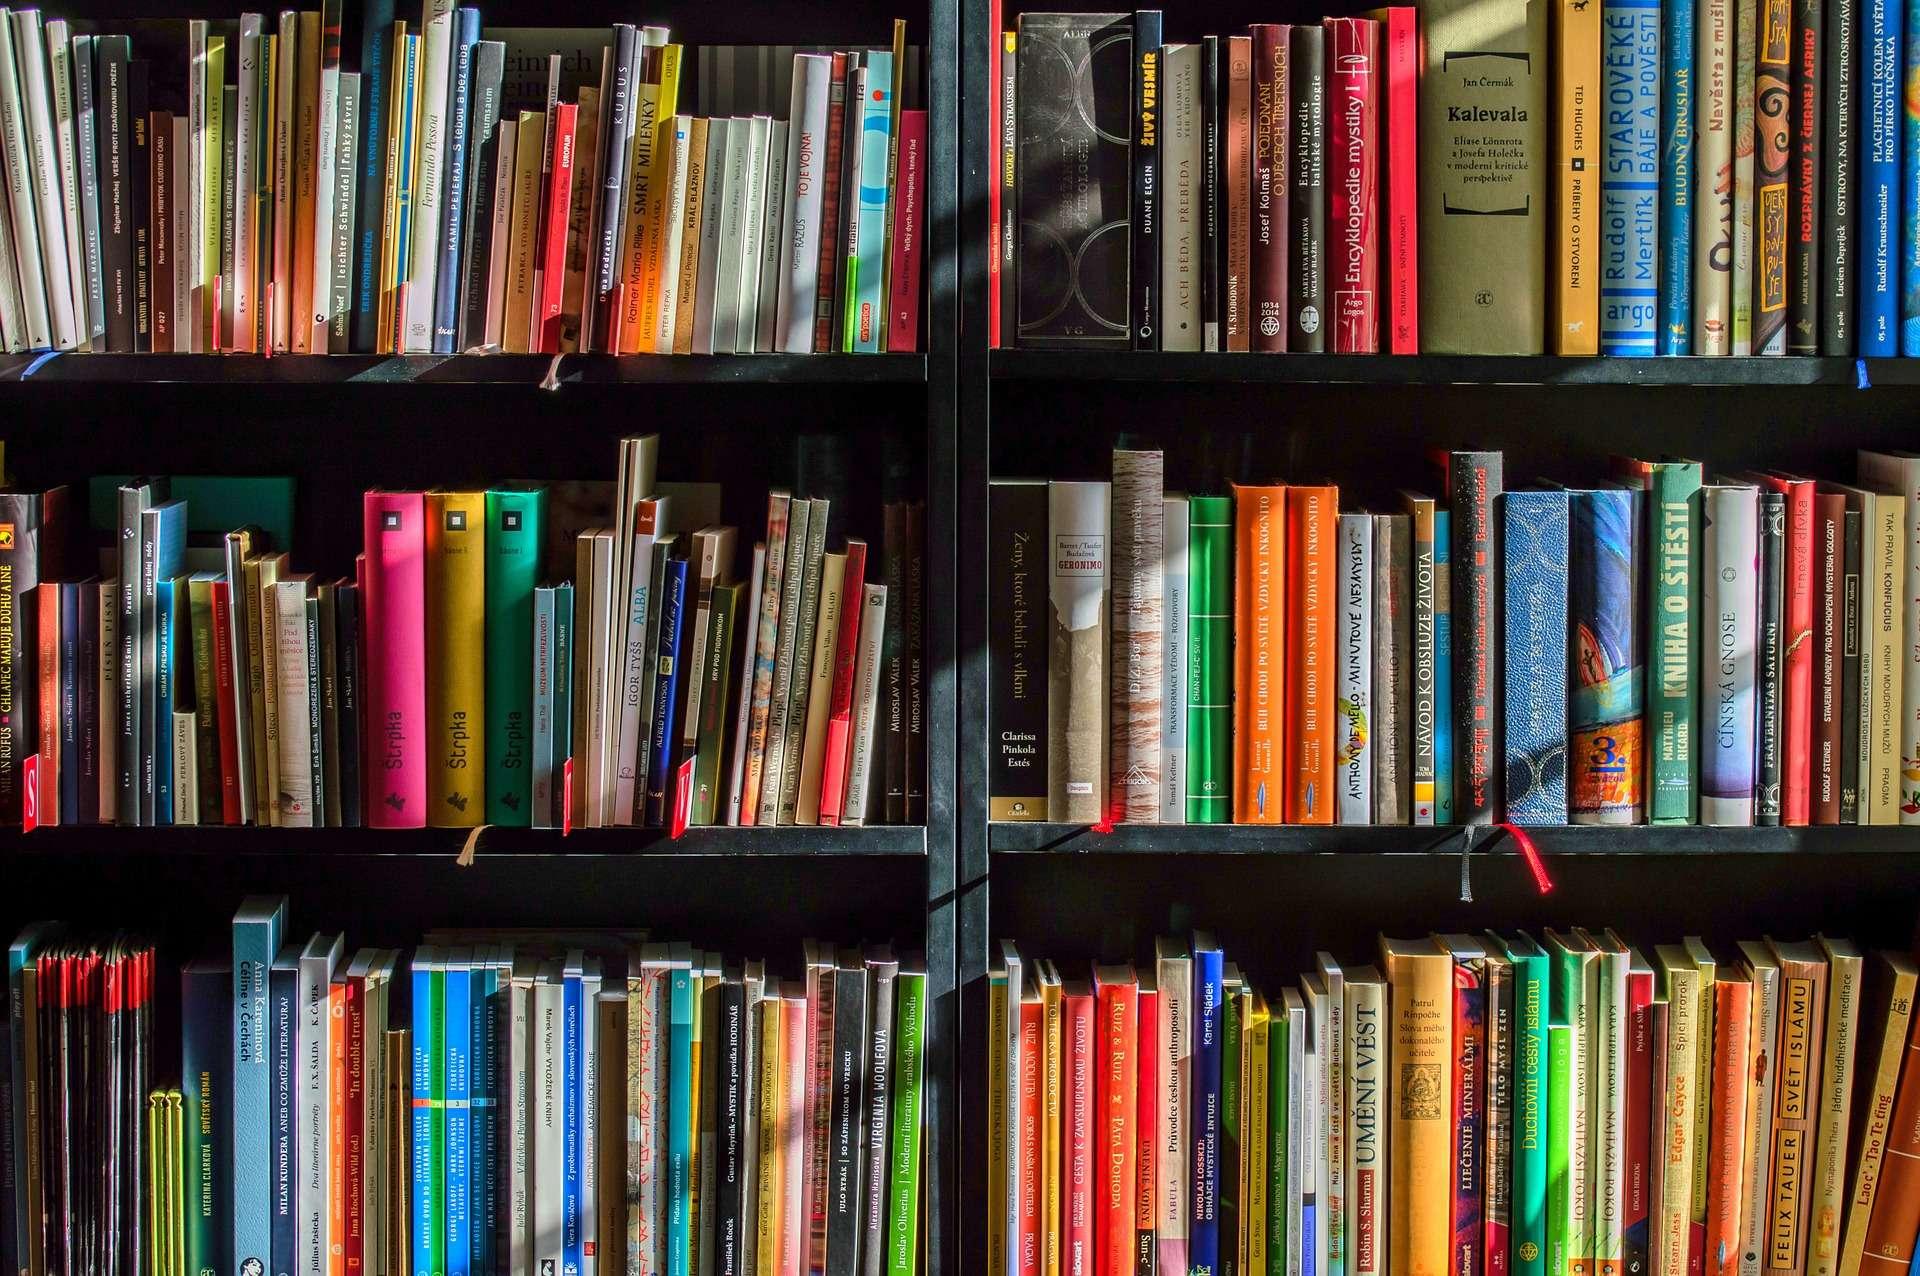 Three rows of books